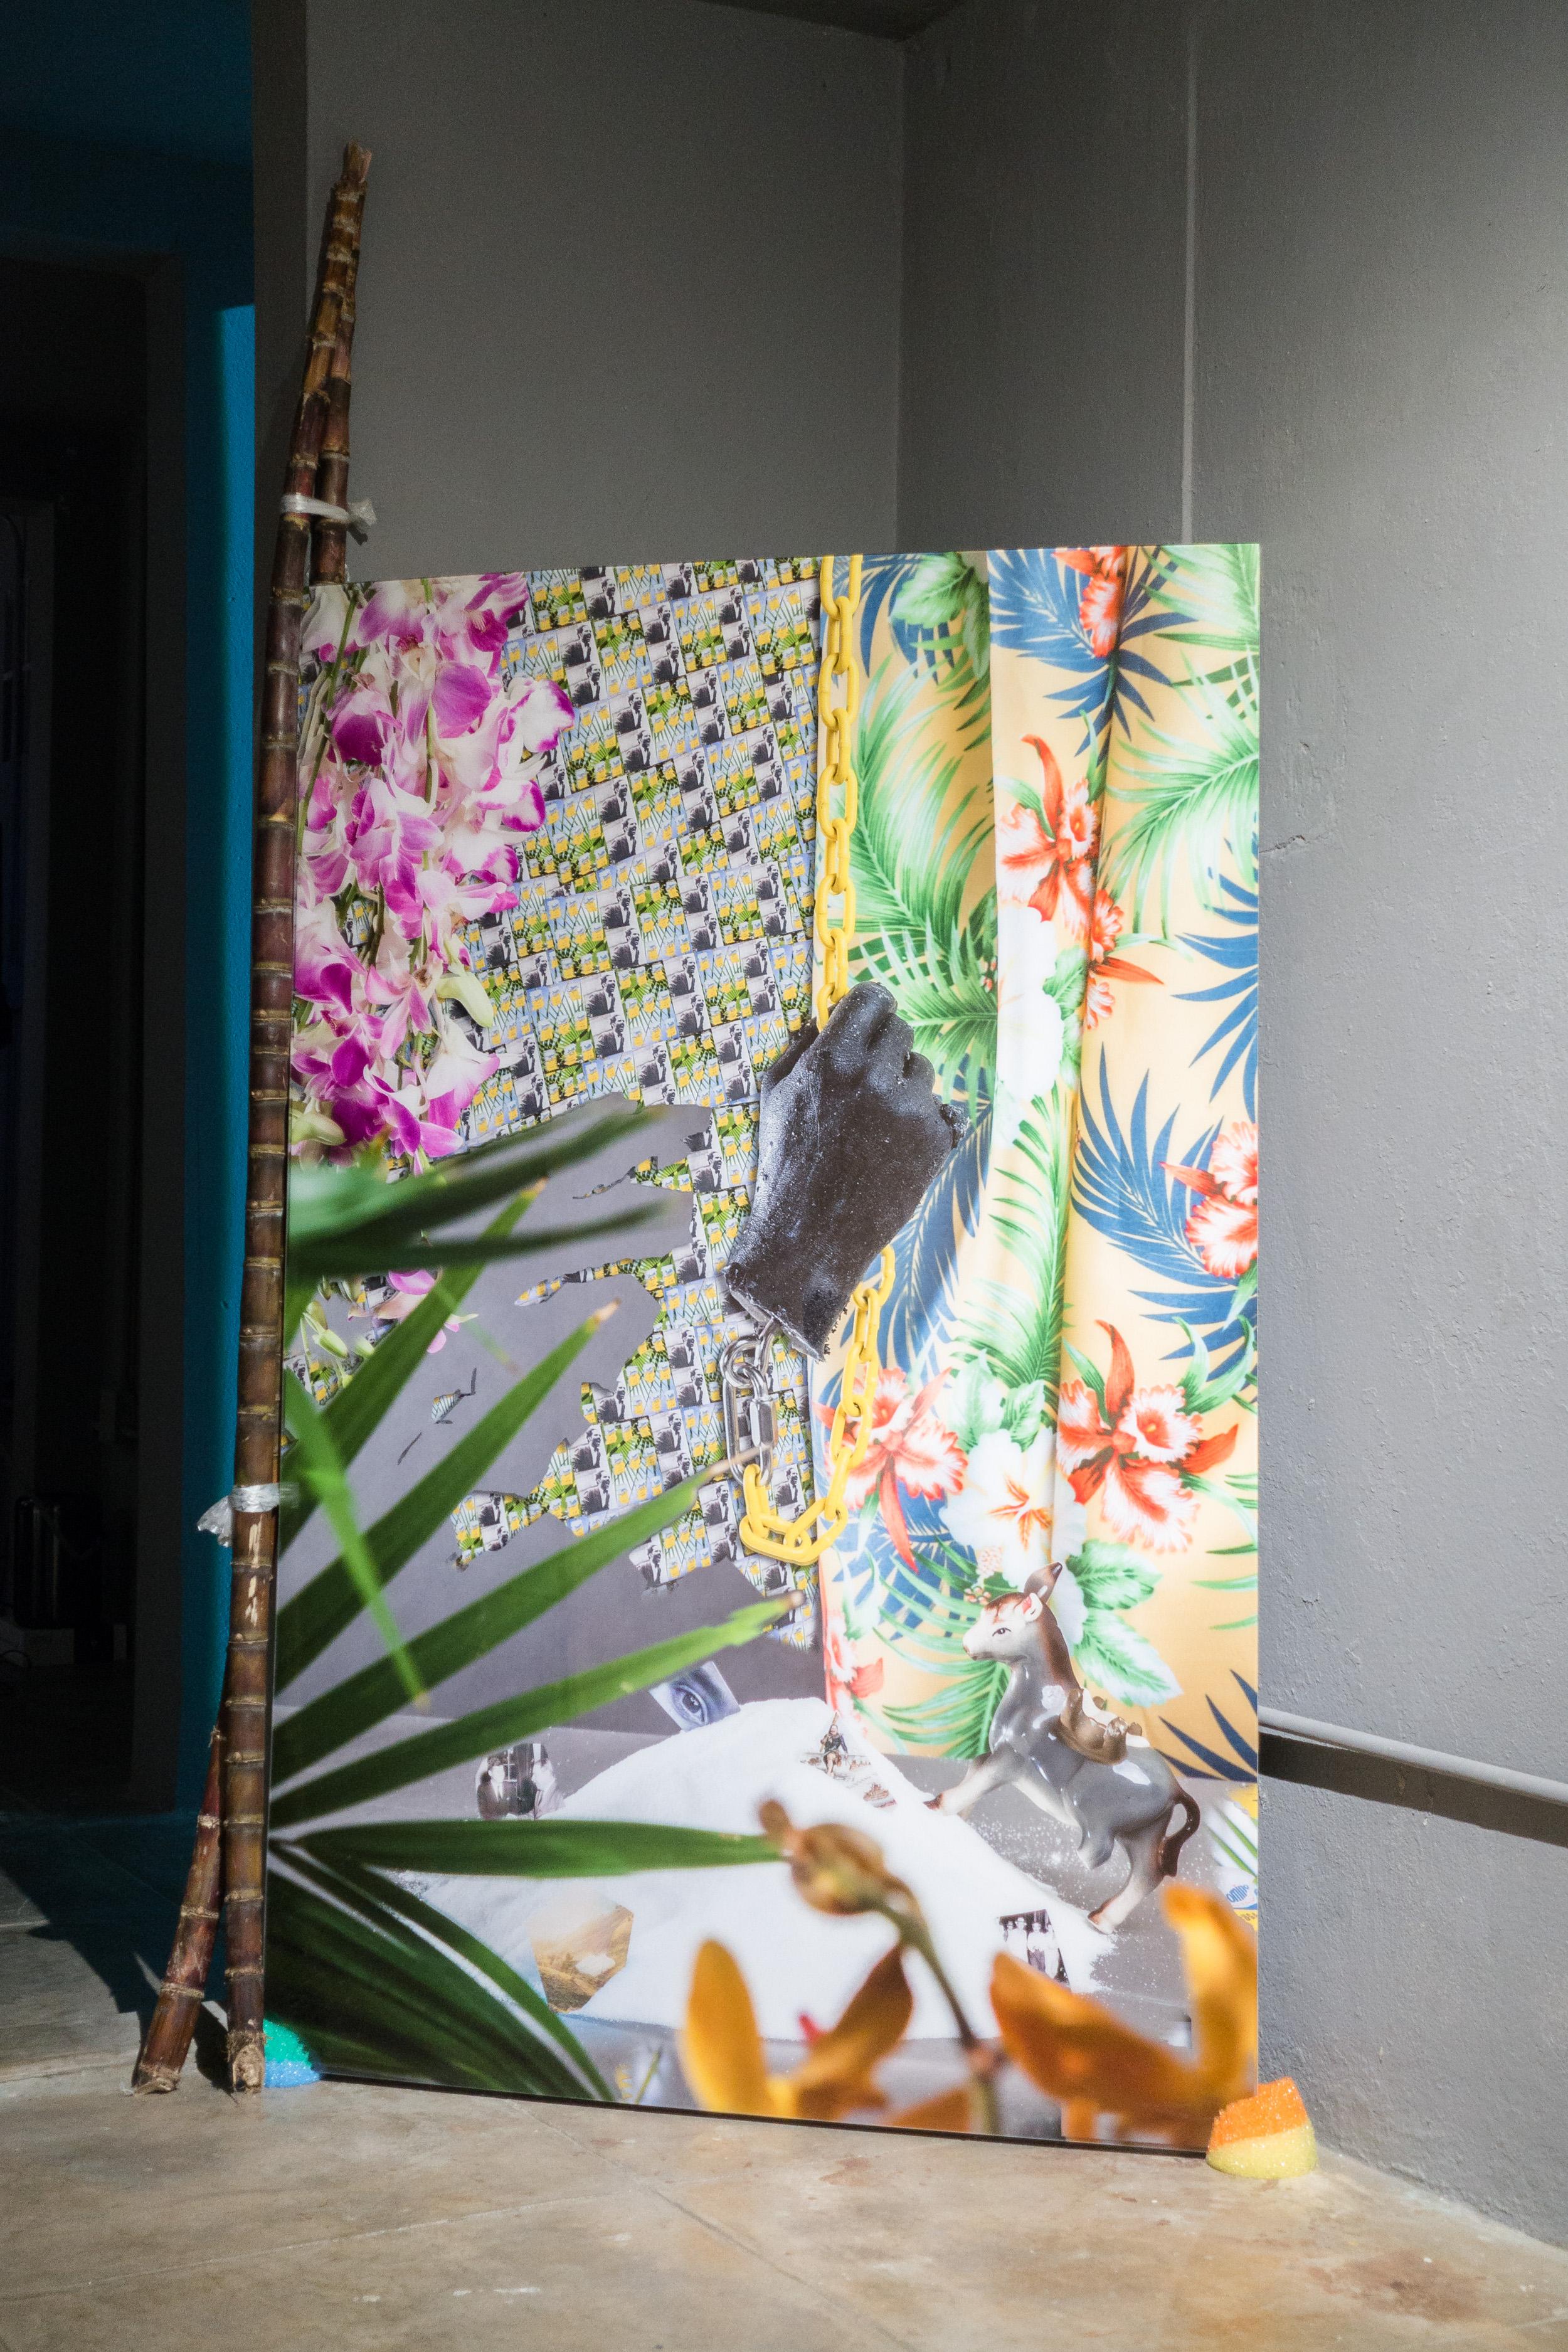 Installation view of Untitled (El Burro)